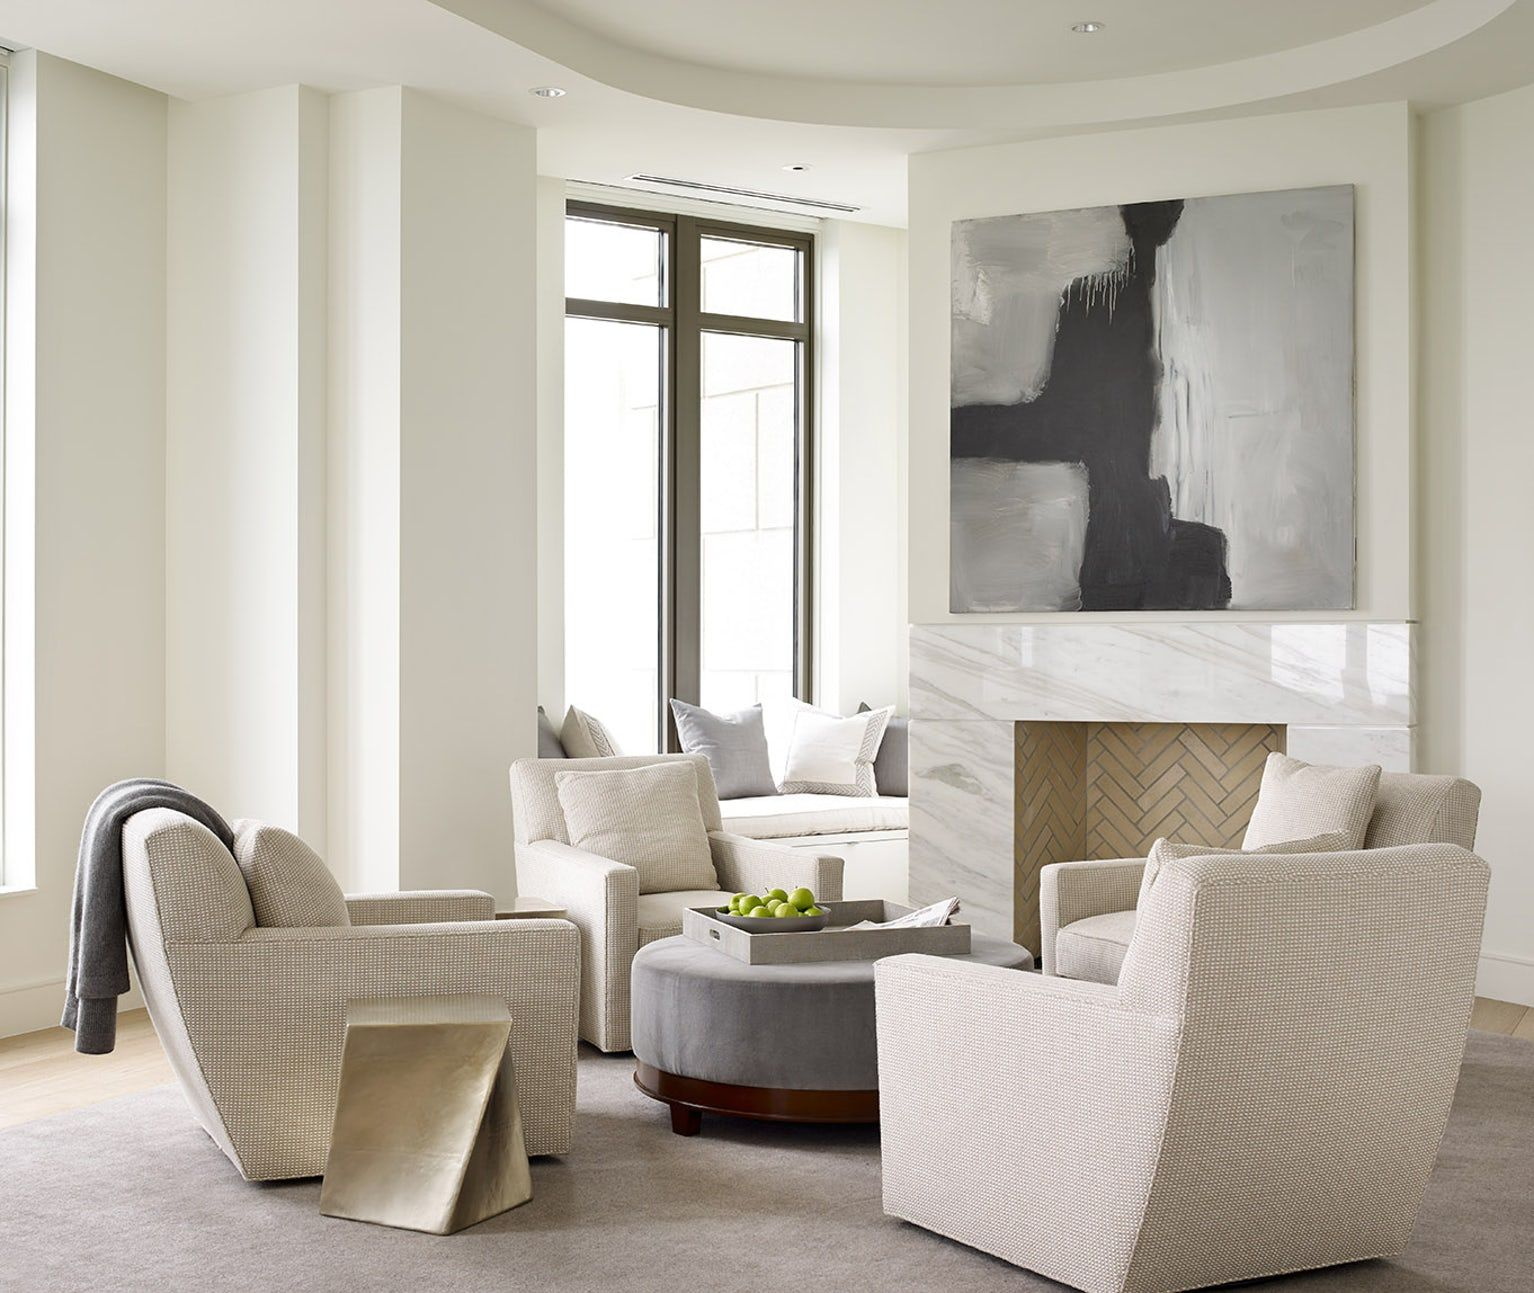 65 best fireplace ideas beautiful fireplace designs decor rh elledecor com fireplace ideas modern fireplace ideas wood